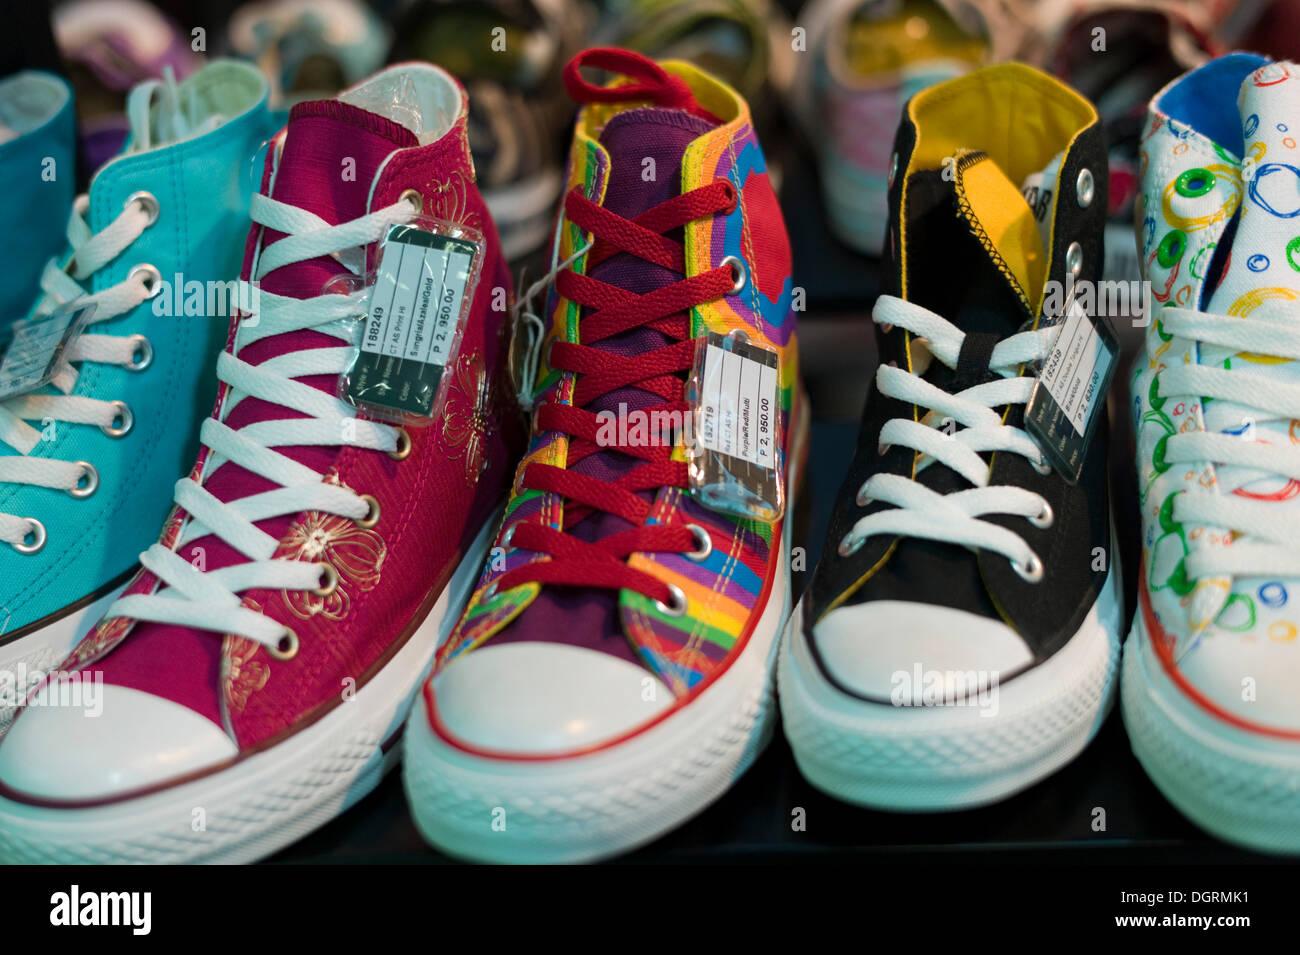 Skate shoes in cebu - Sneakers Ayala Center Cebu Shopping Center Cebu Philippines Asia